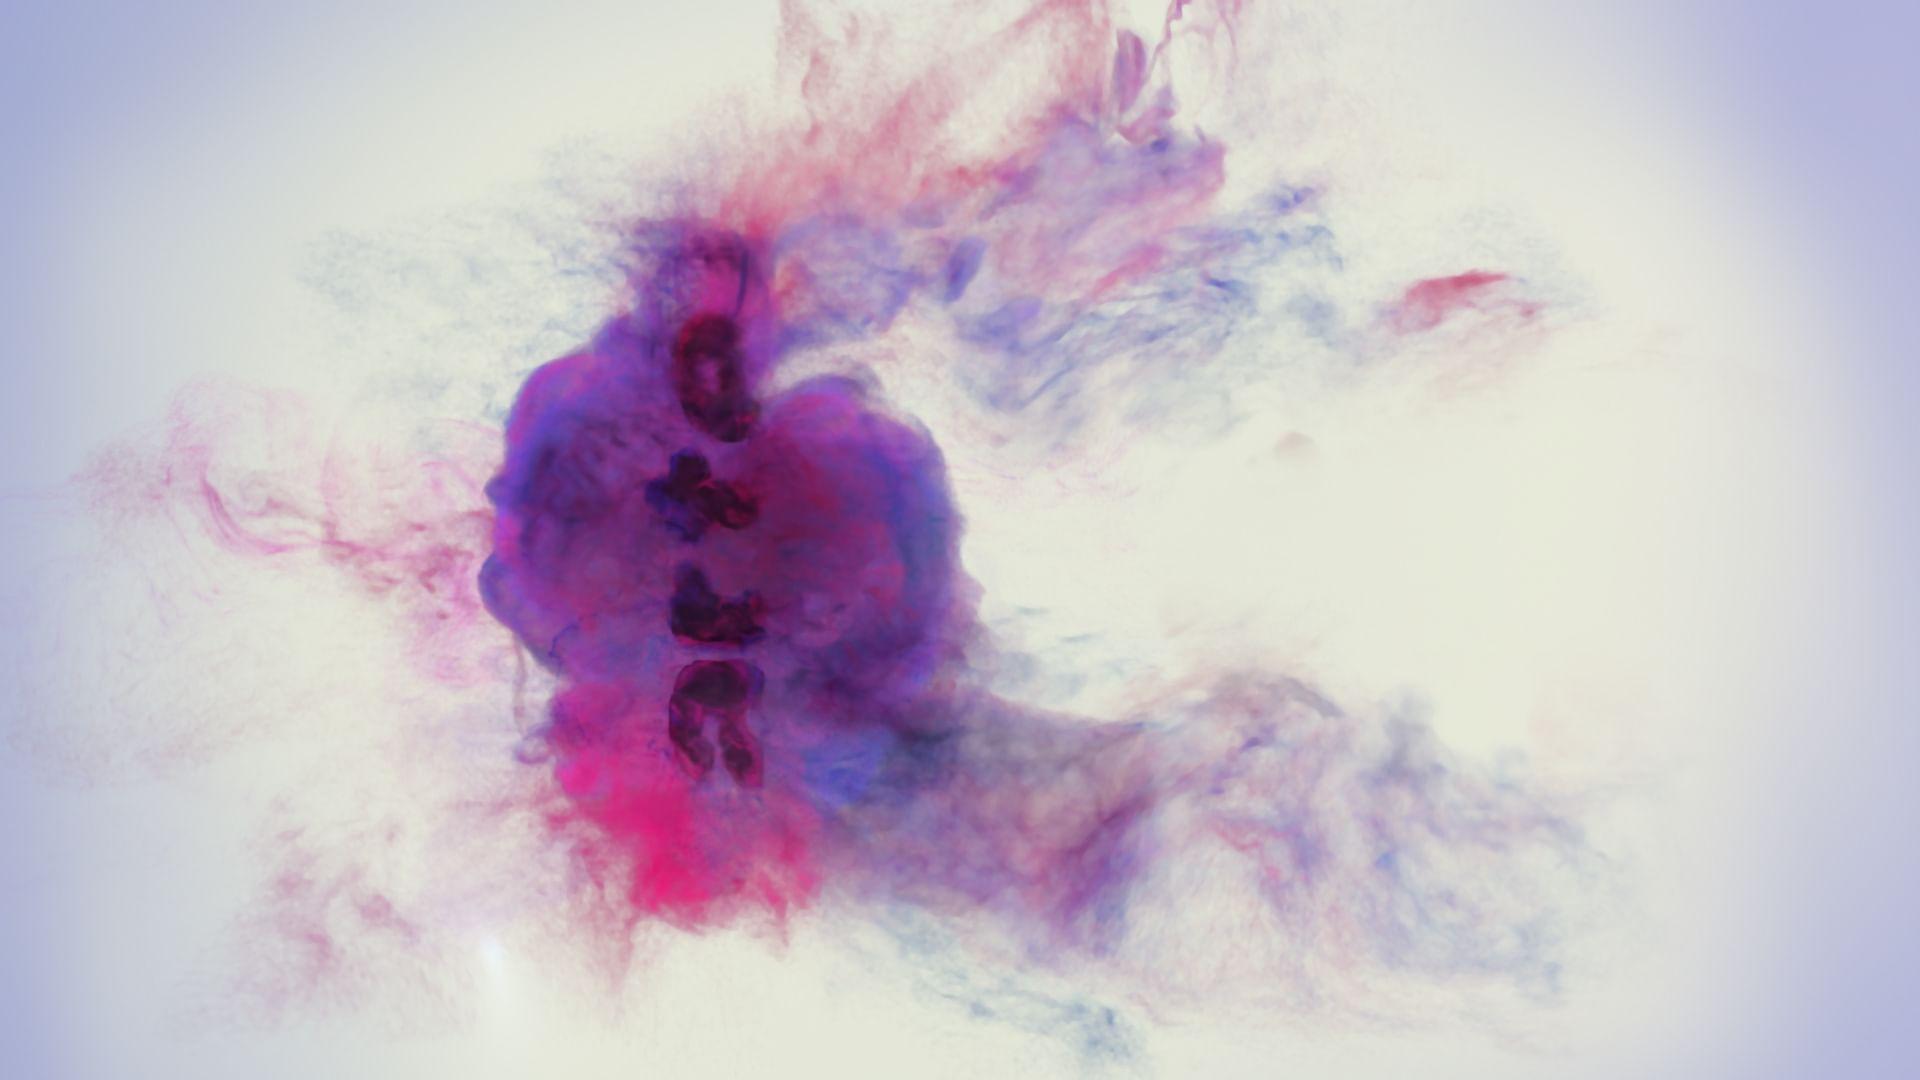 Kenia: Grundeinkommen, bedingungslos | ARTE